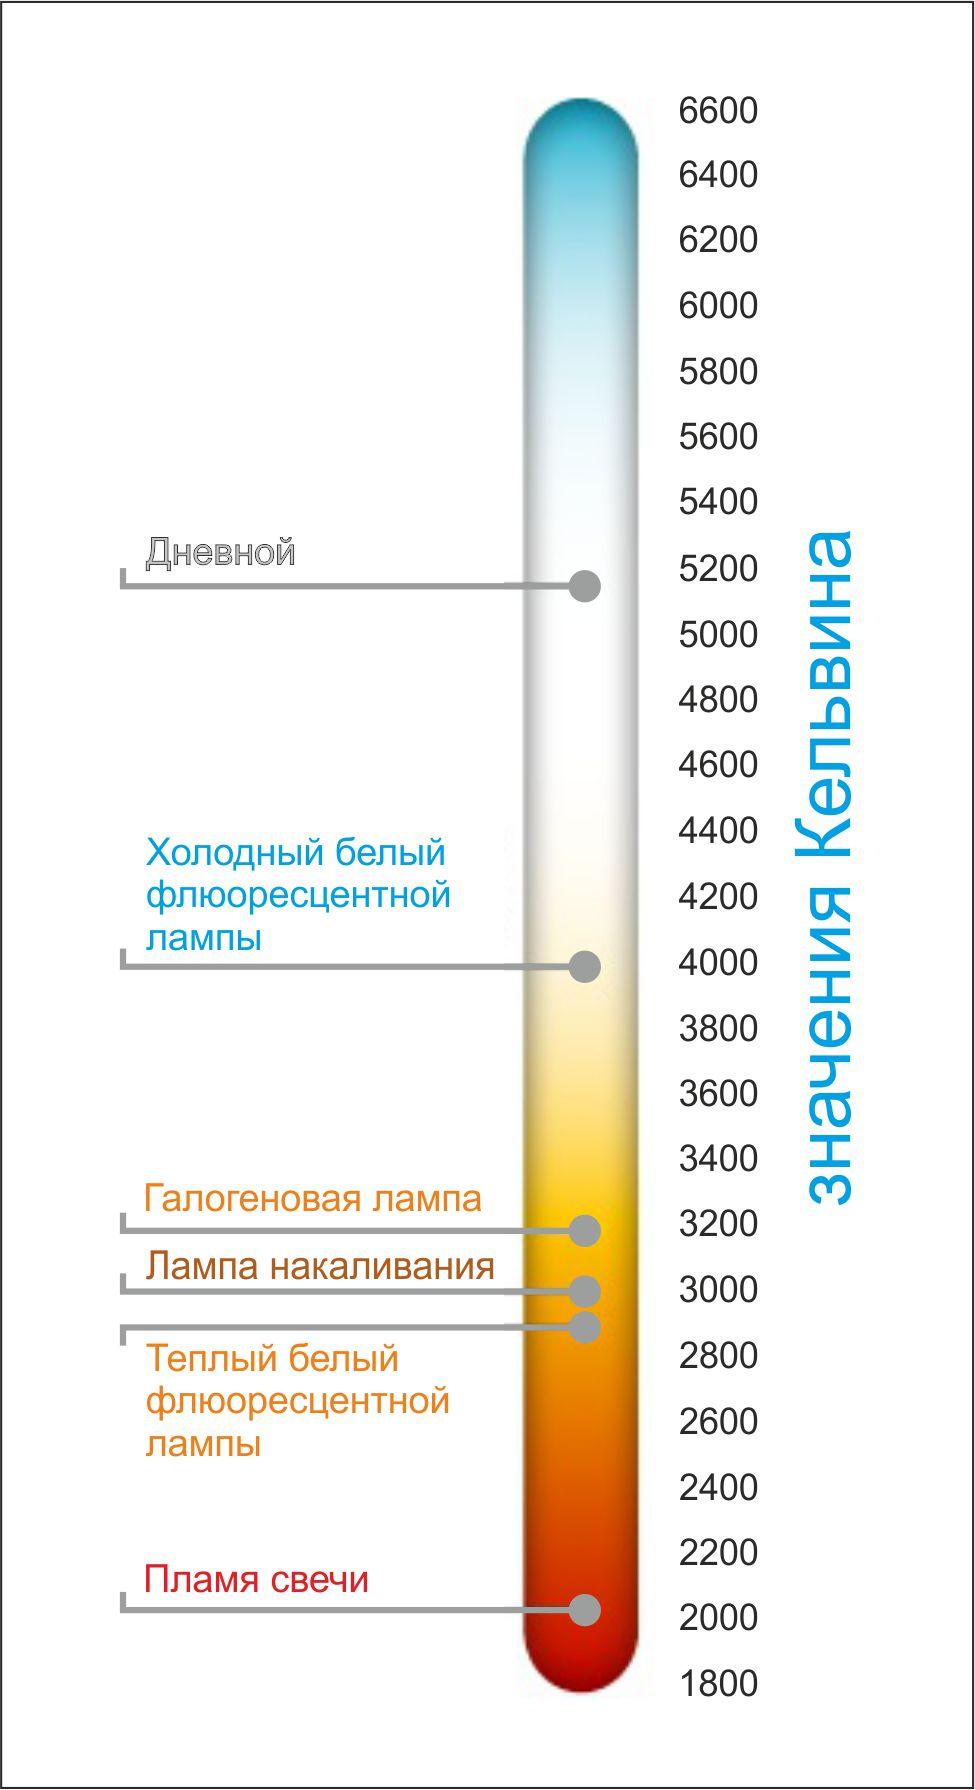 Люкс (люмен на квадратный метр) (lx, международная система си) → метр-кандела (фотографические единицы)